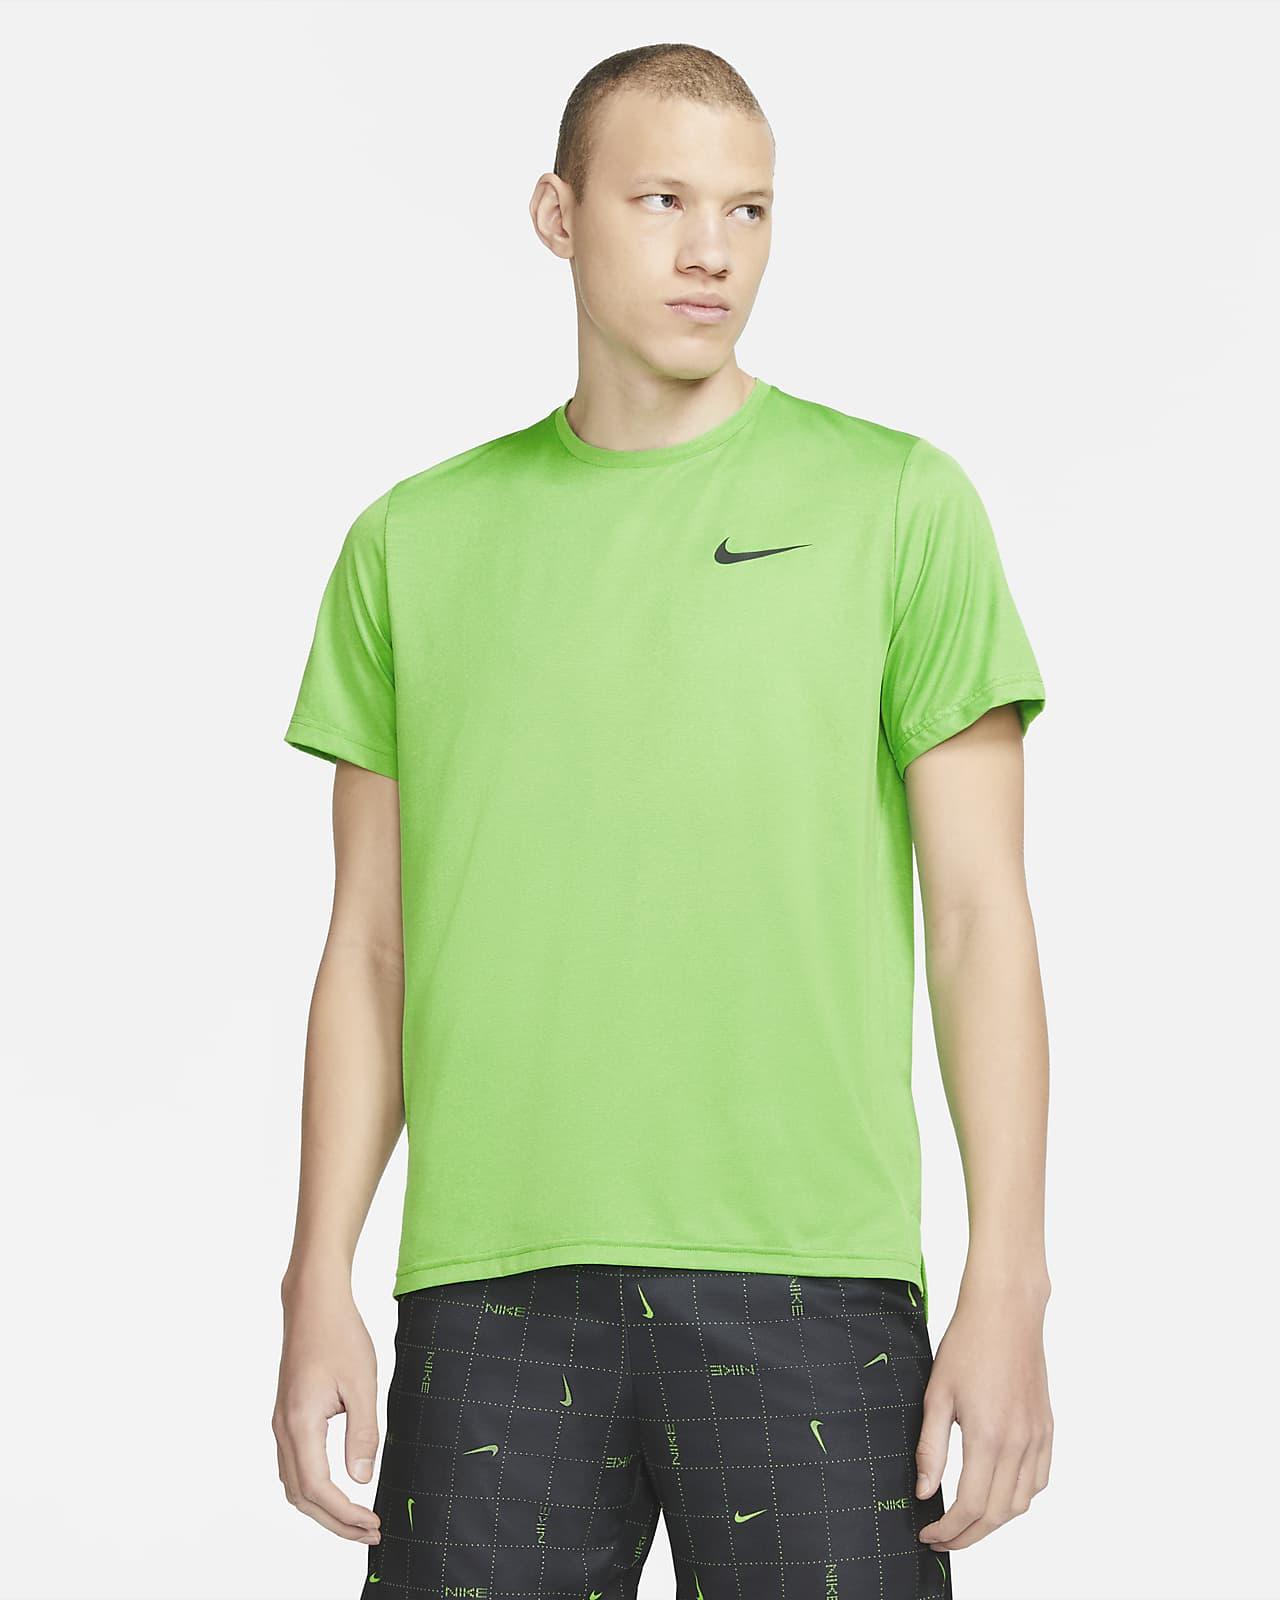 Kortärmad tröja Nike Pro Dri-FIT för män